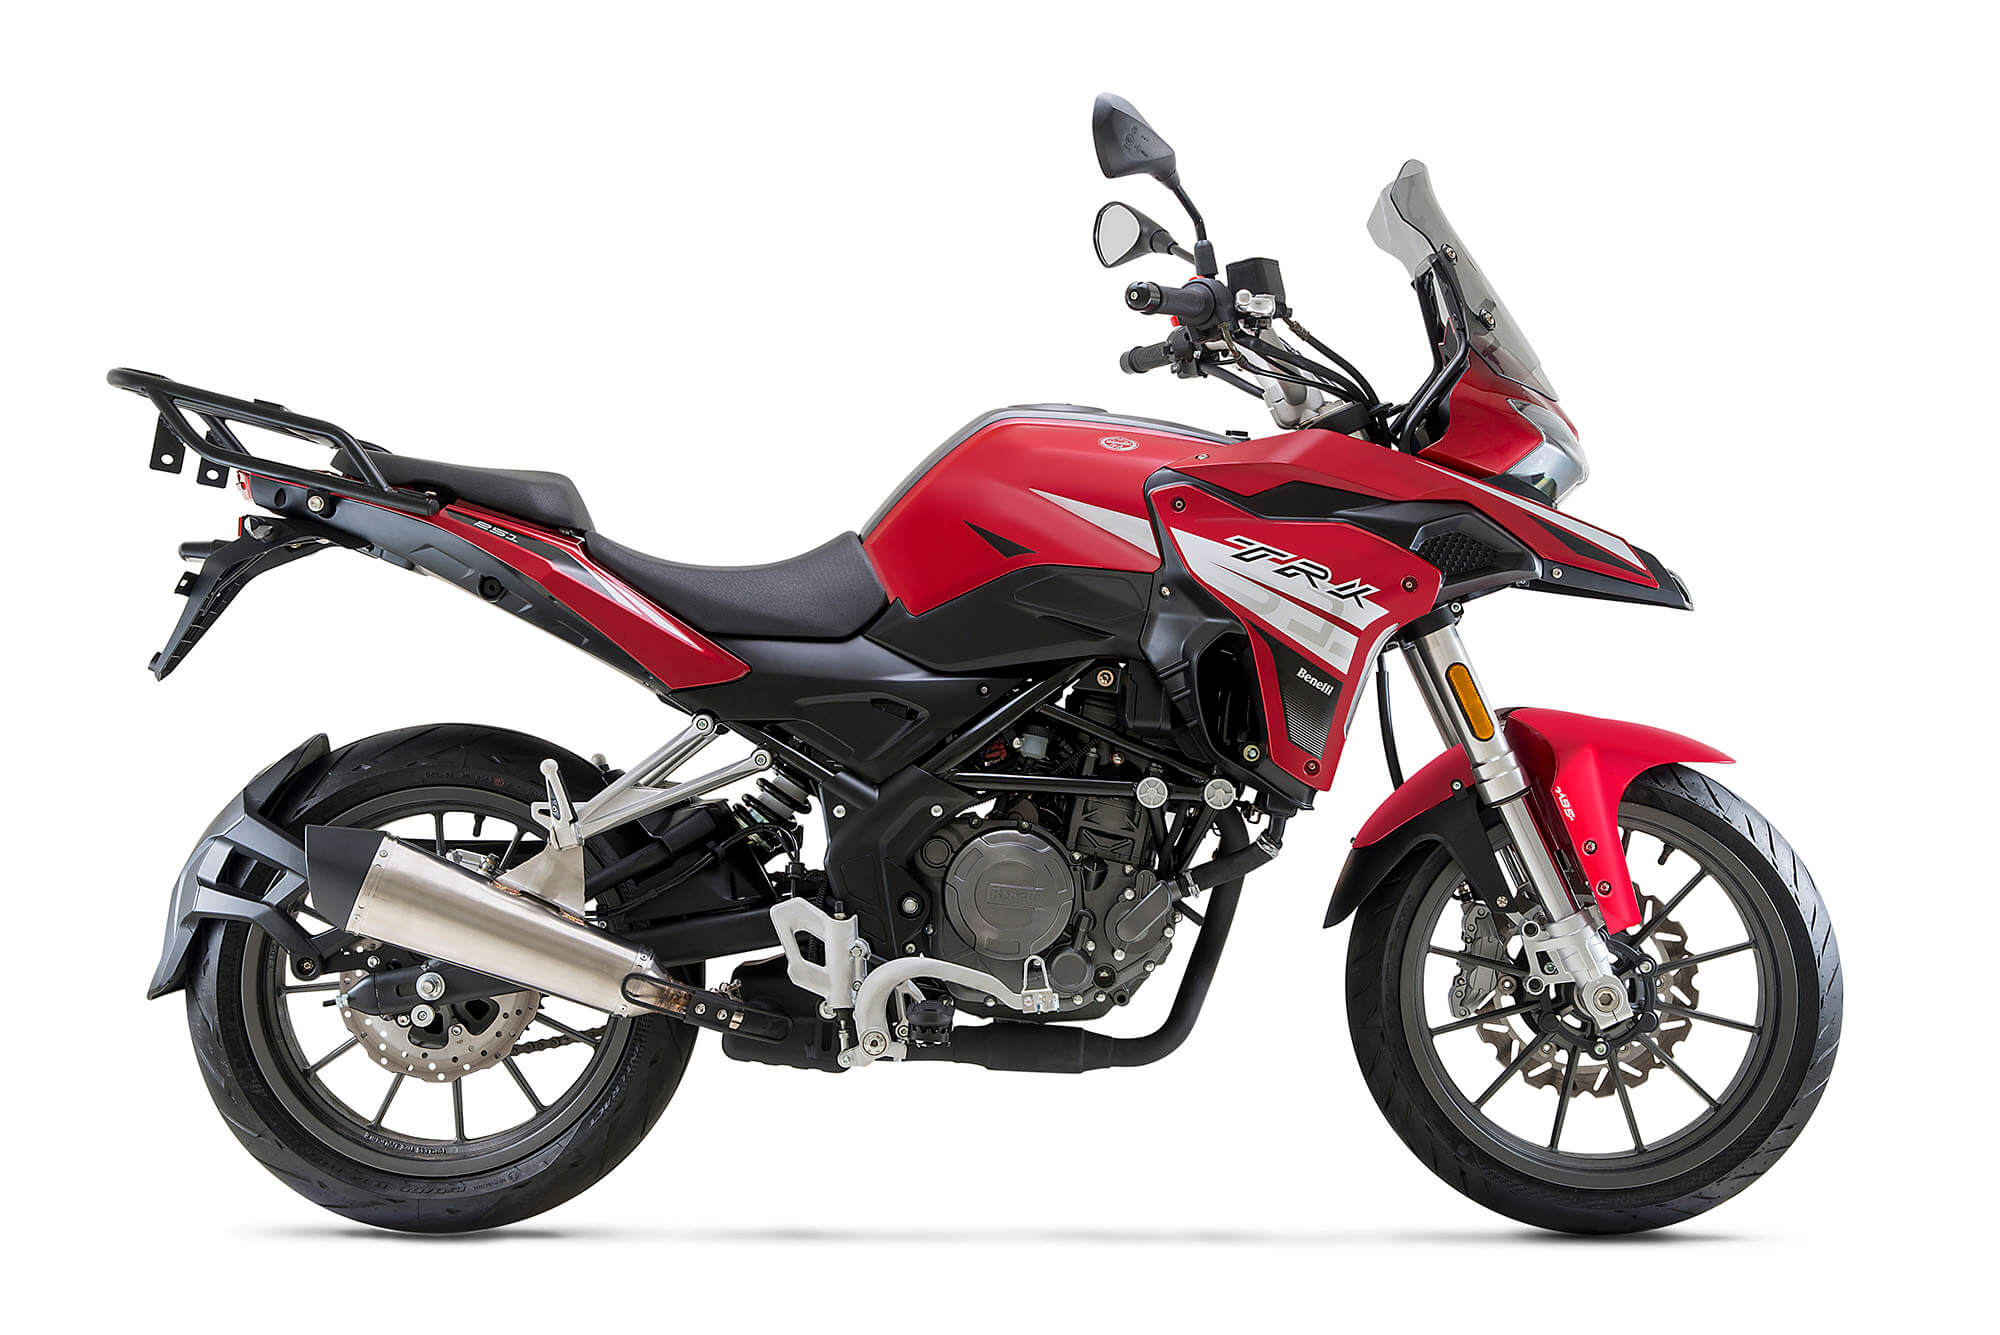 comprar-motos-benelli-trk-251-rojo-motissimo-barcelona